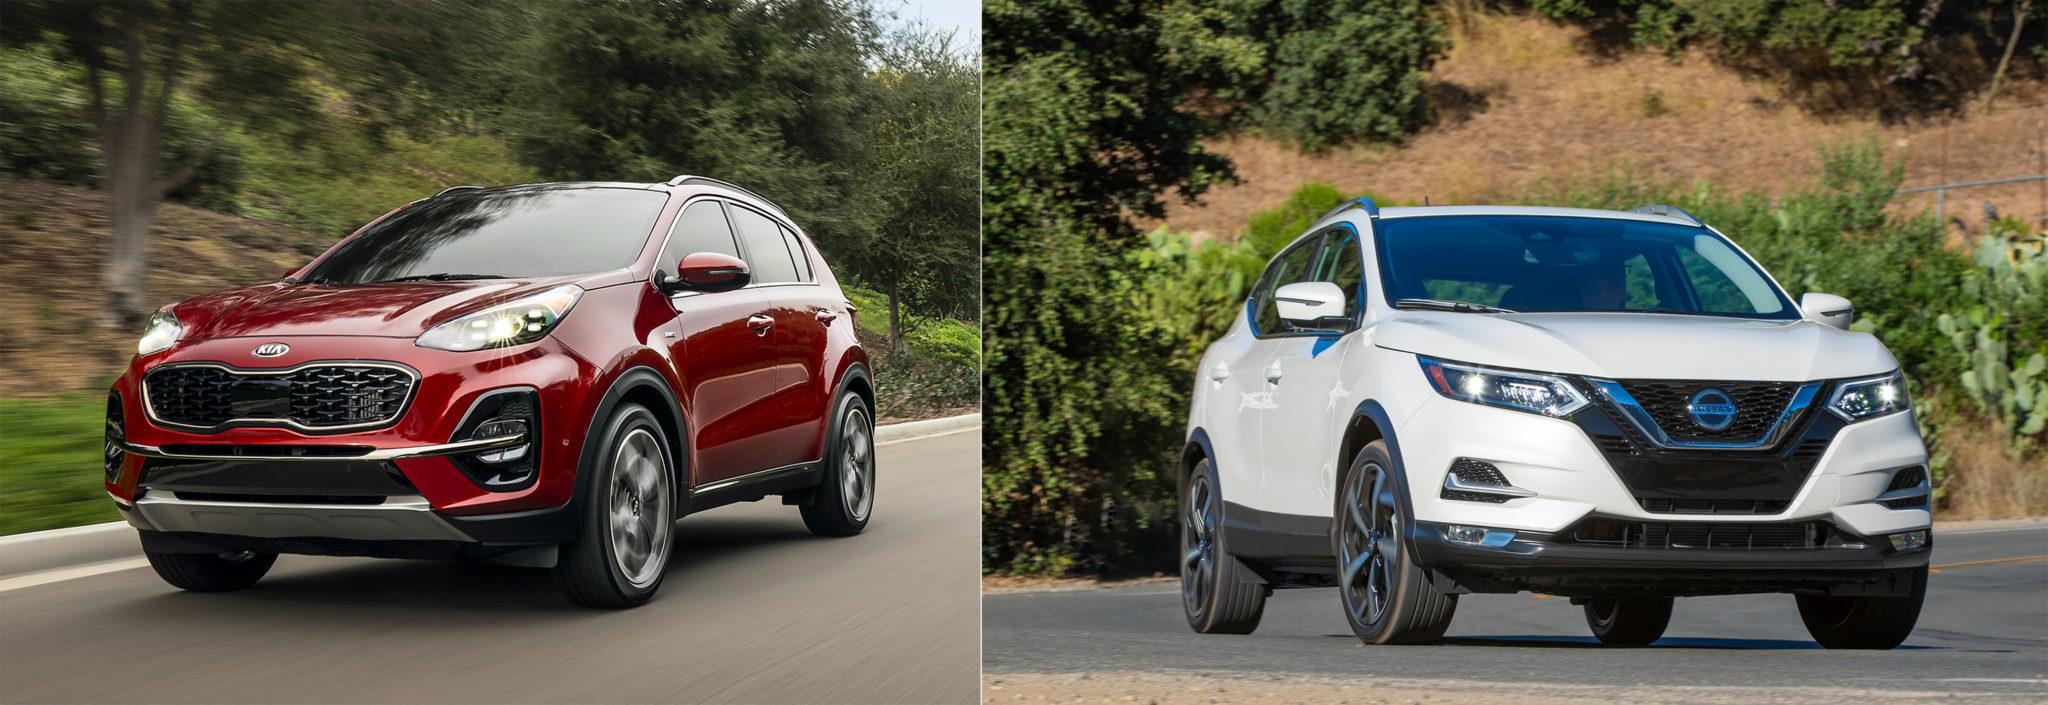 Kia Sportage vs Nissan Rogue Sport